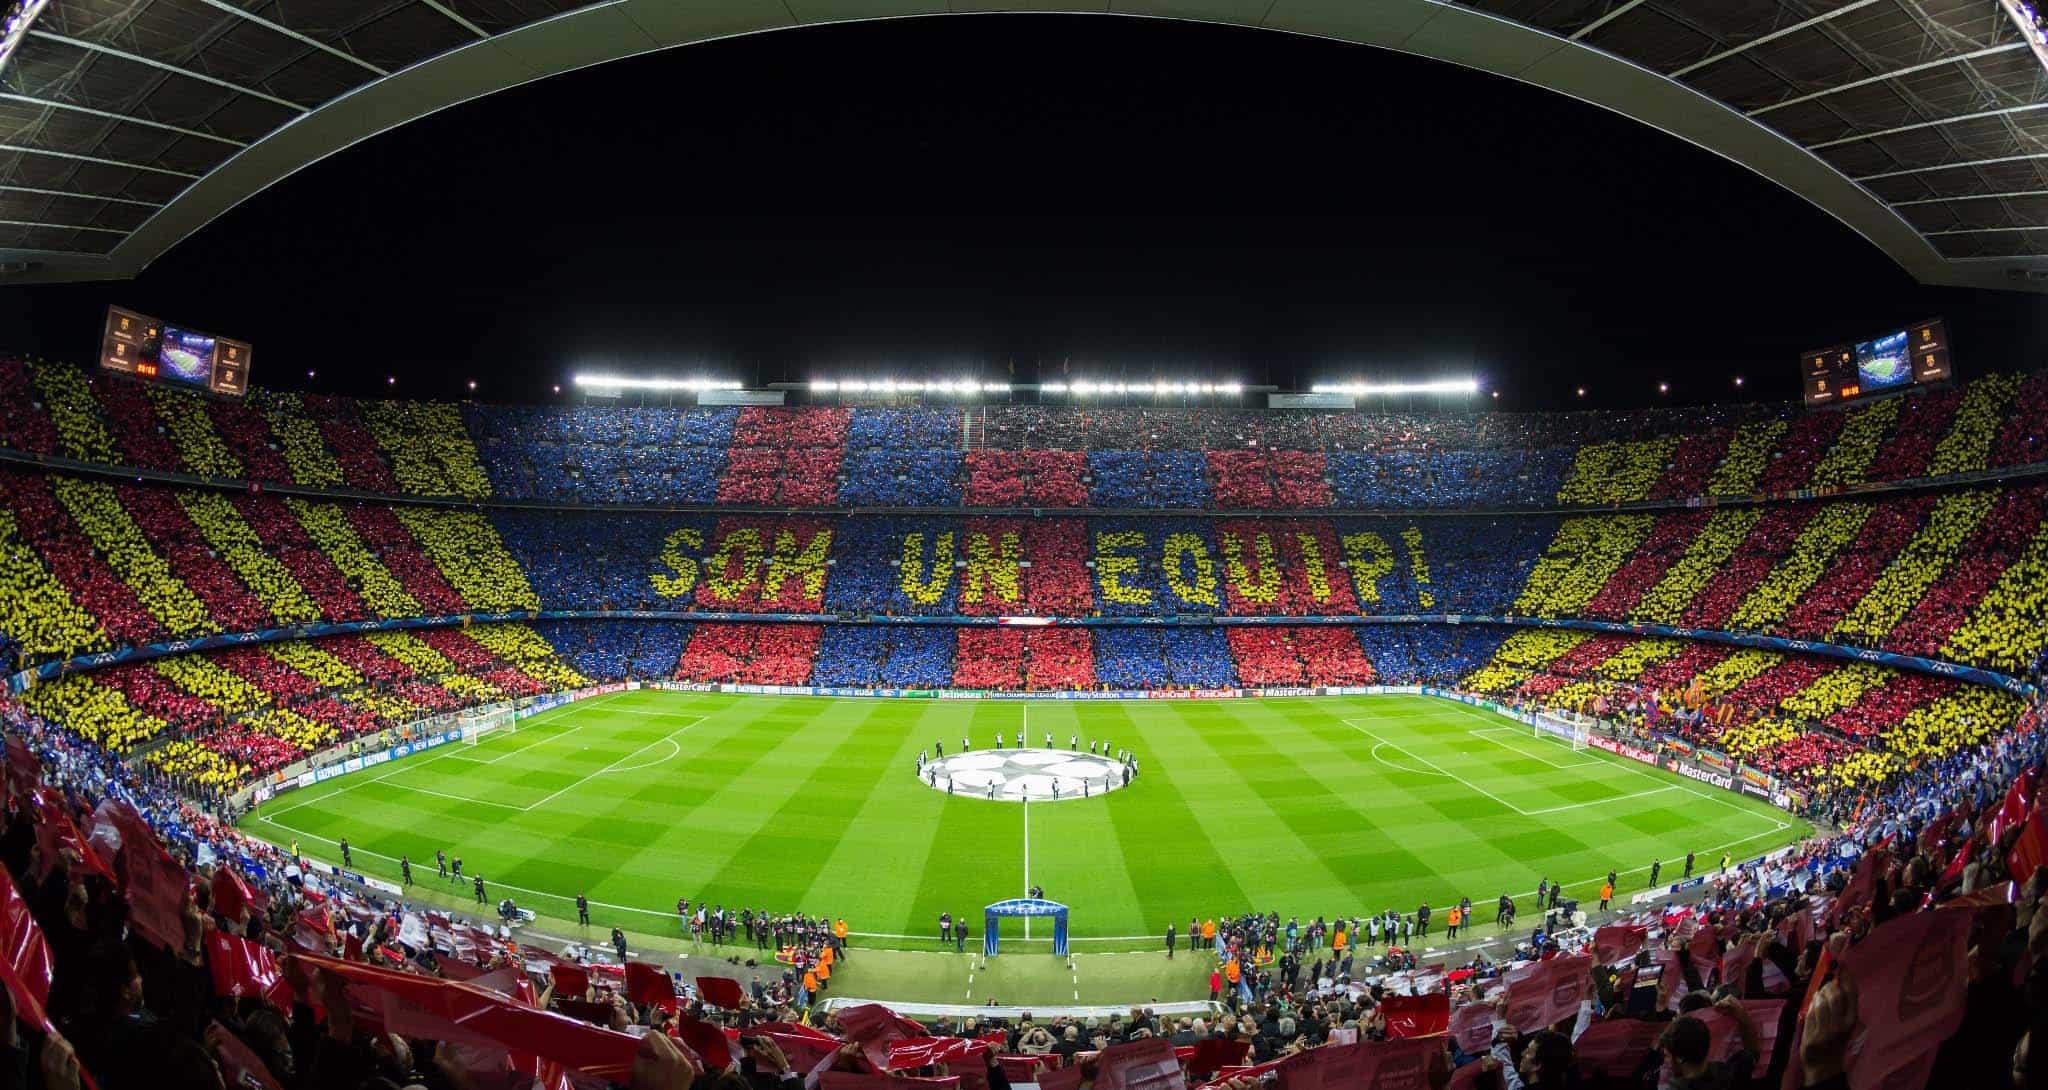 Fotbollsresor, FC Barcelona Biljetter, Spanien, Camp Nou